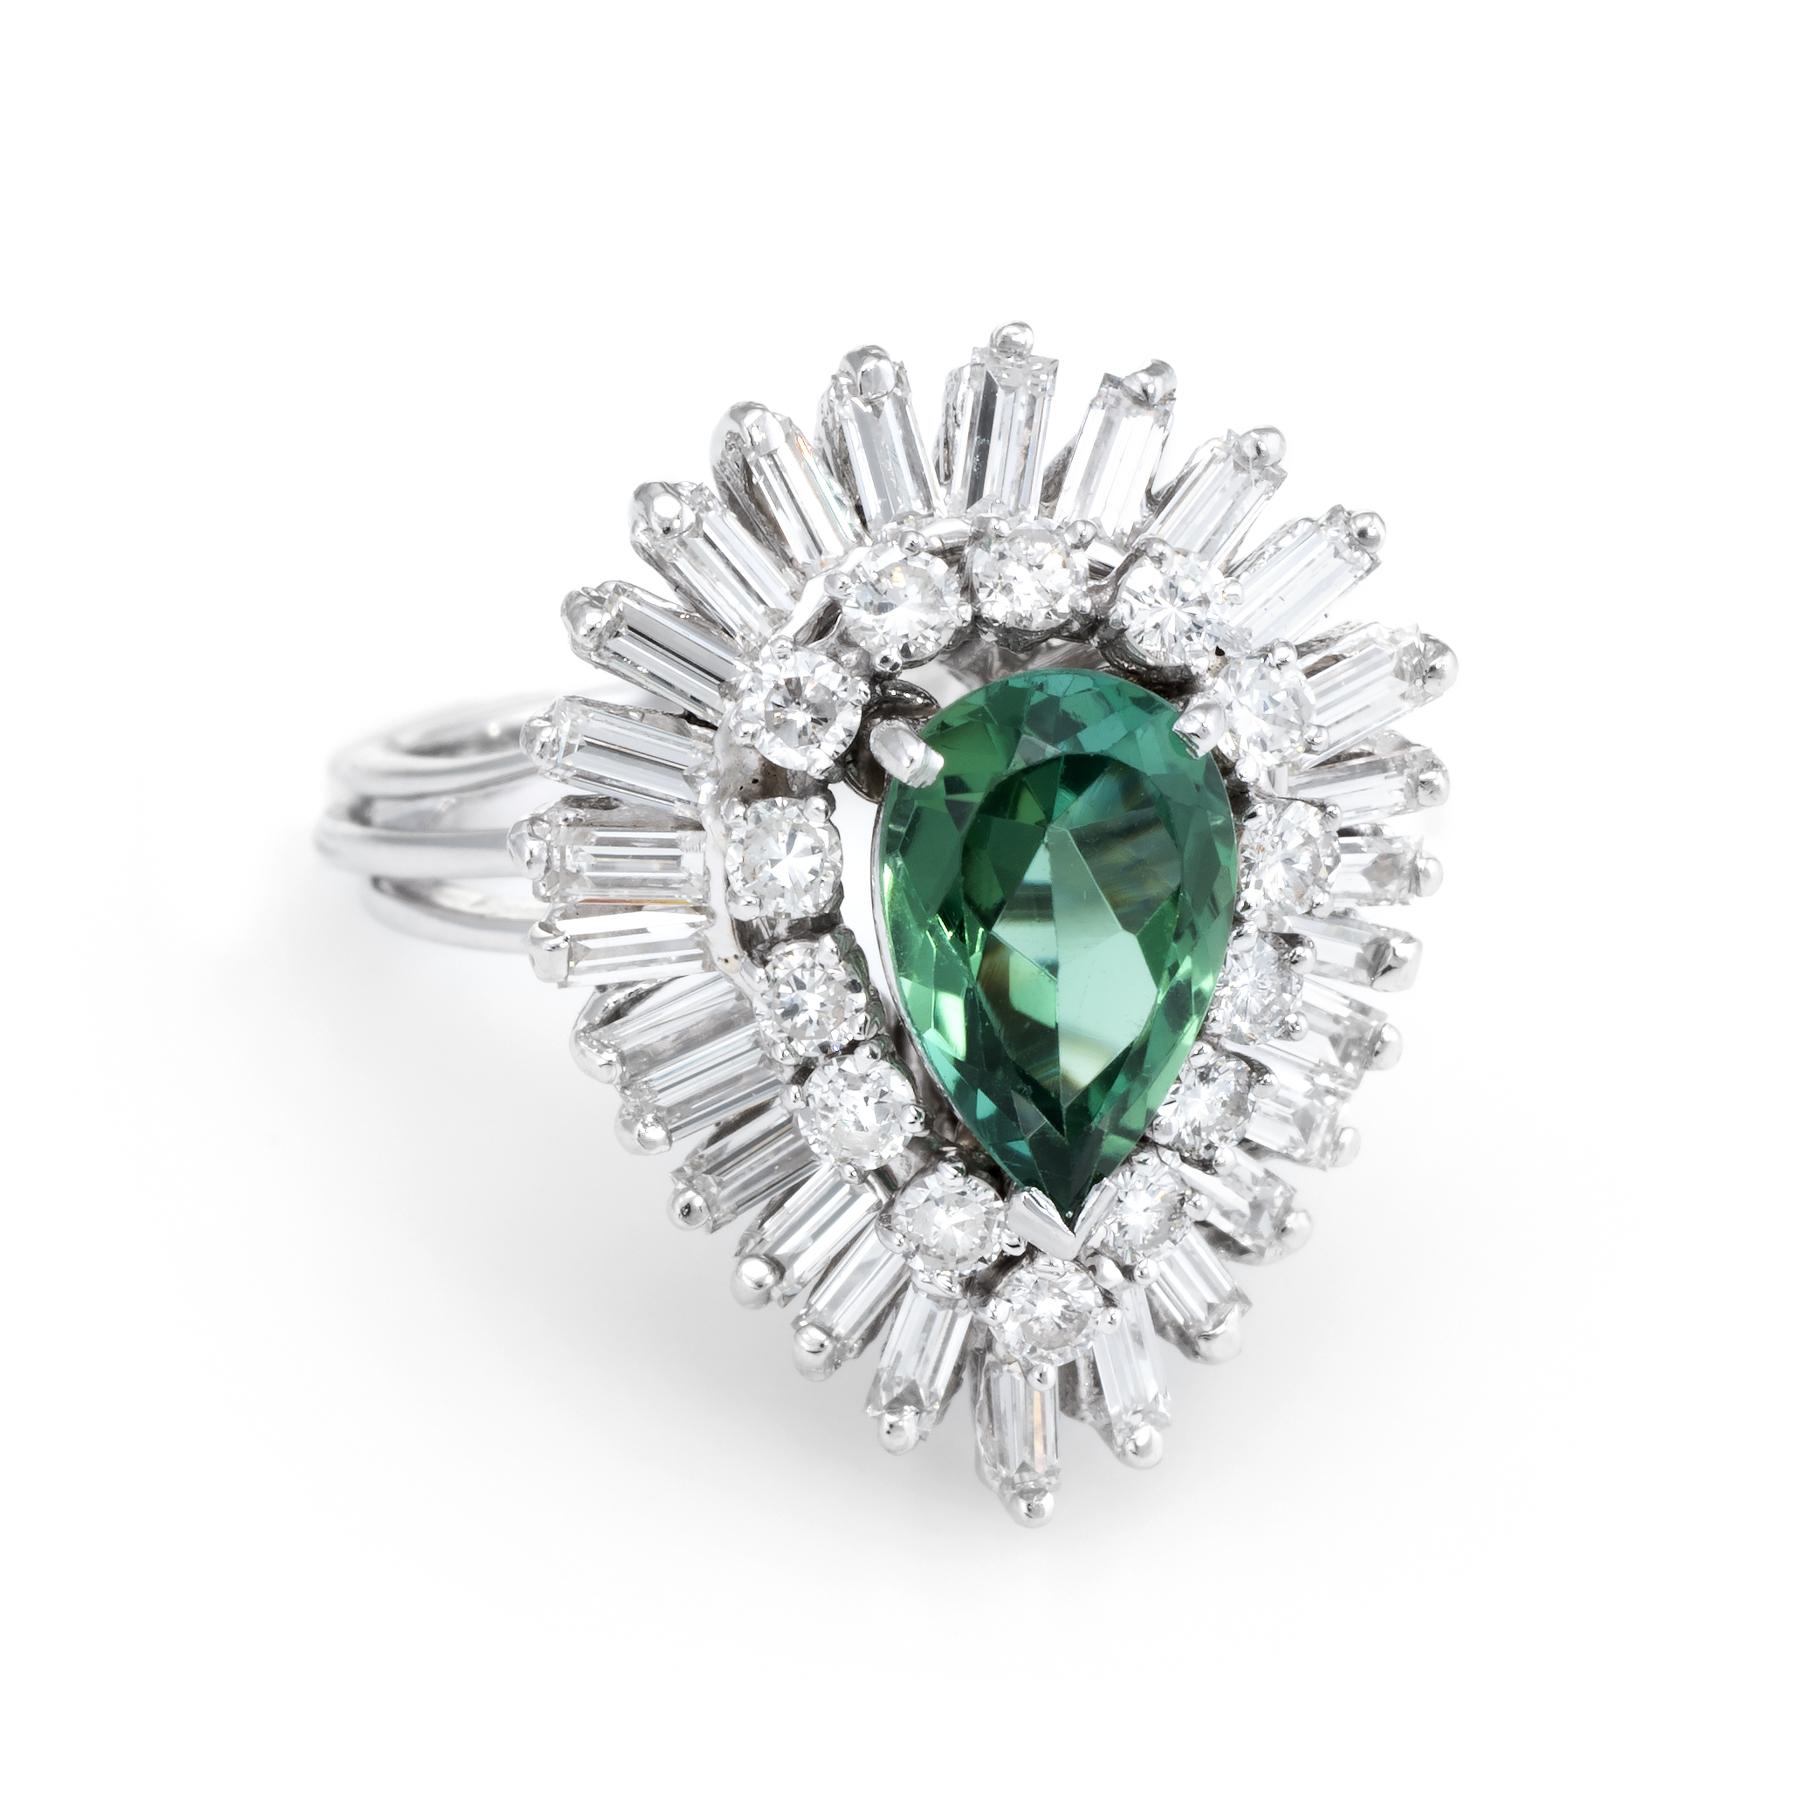 046166db5 Details about Green Tourmaline Diamond Ballerina Cocktail Ring Vintage 14k  White Gold Estate